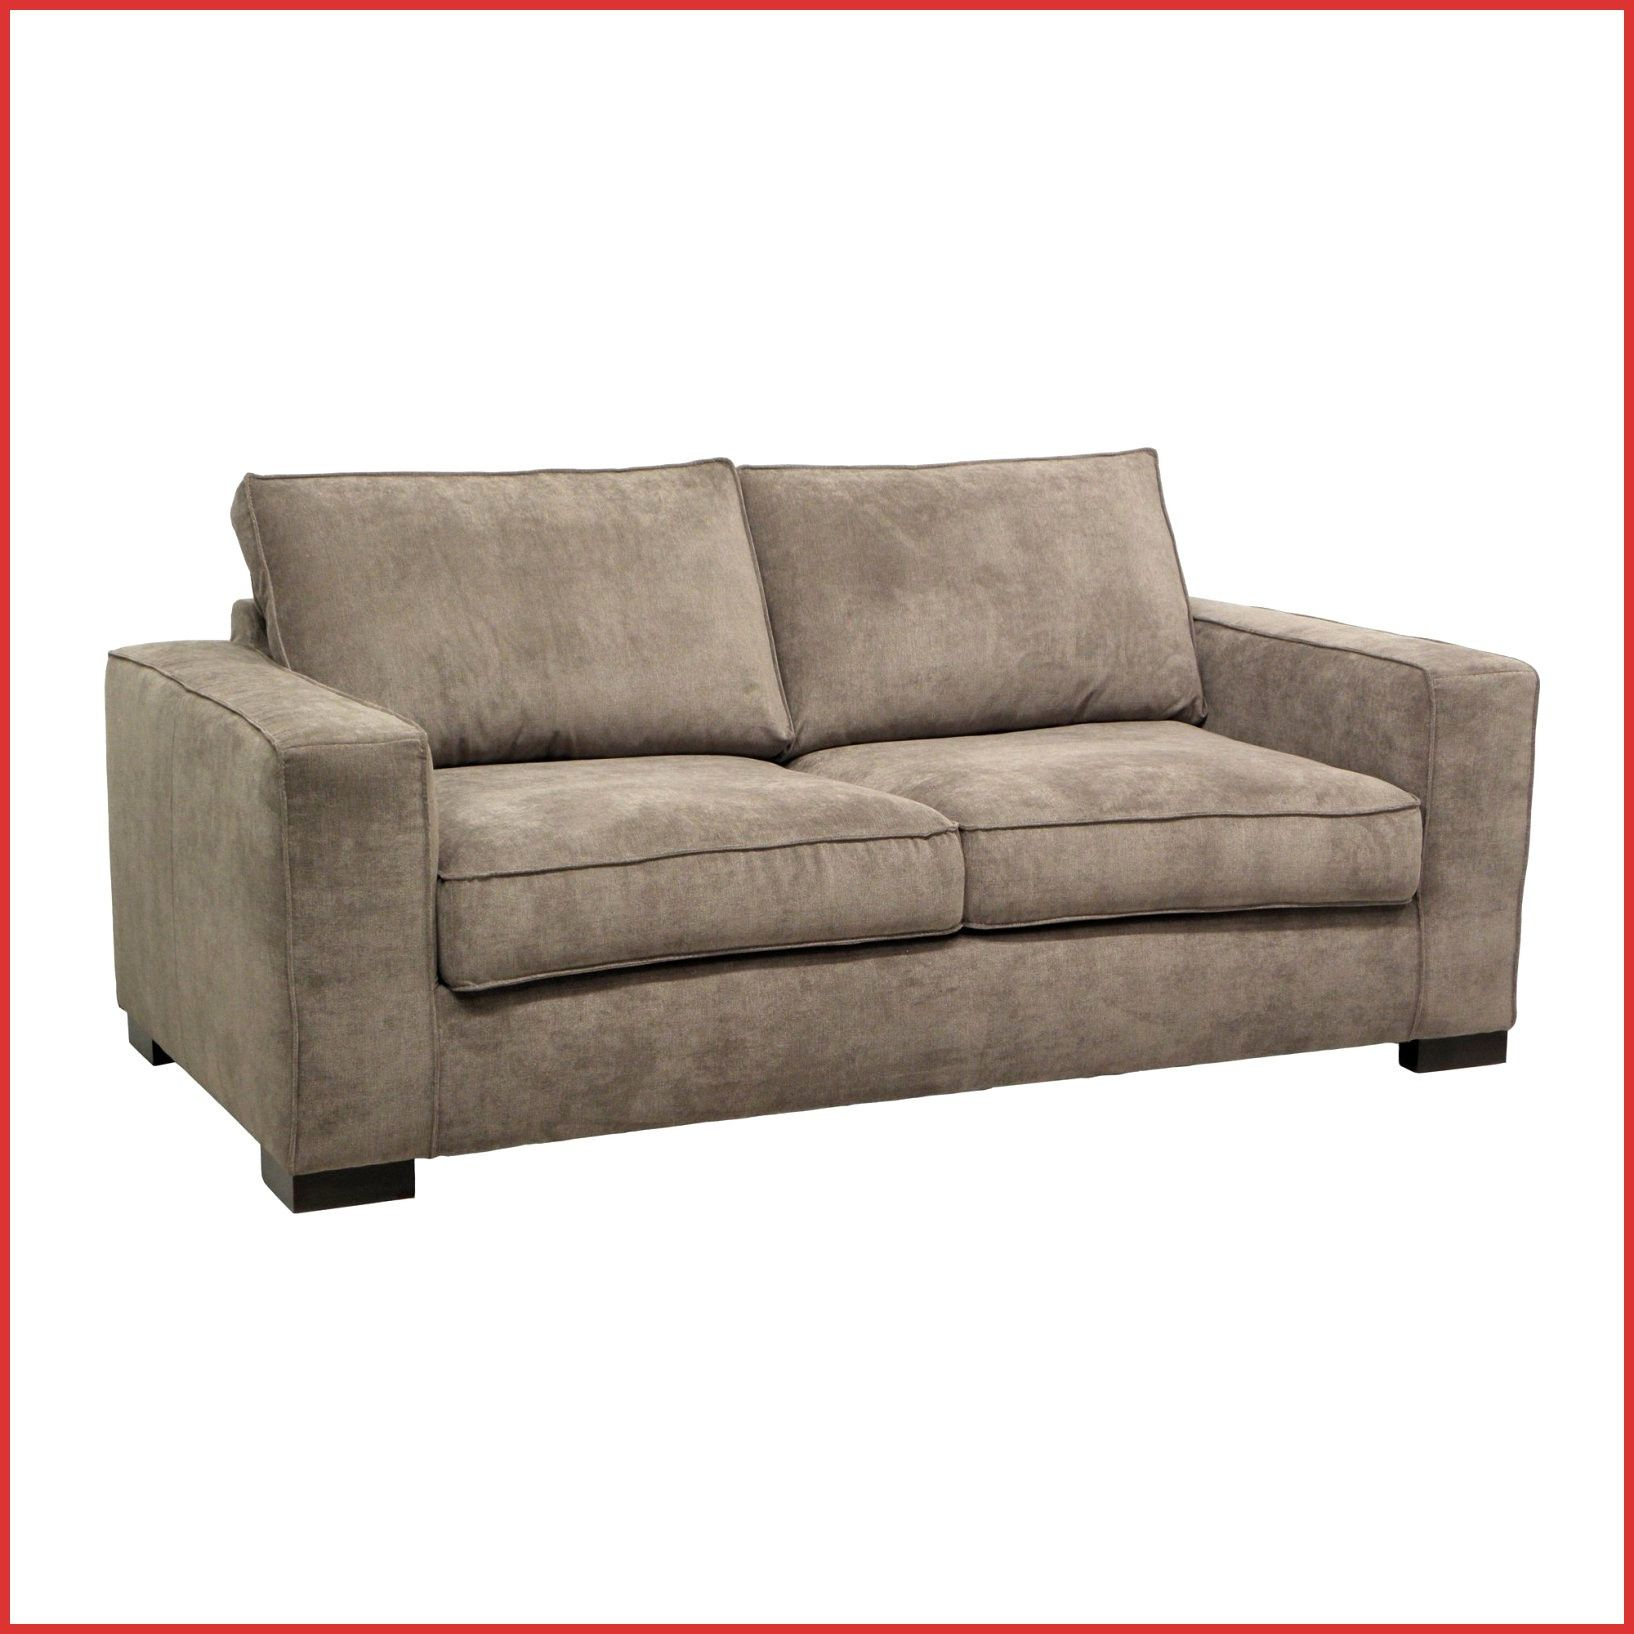 16 Animé Conforama Canapé 2 Places Image | Outdoor Sofa ... avec Canapé Convertible 1 Place Conforama